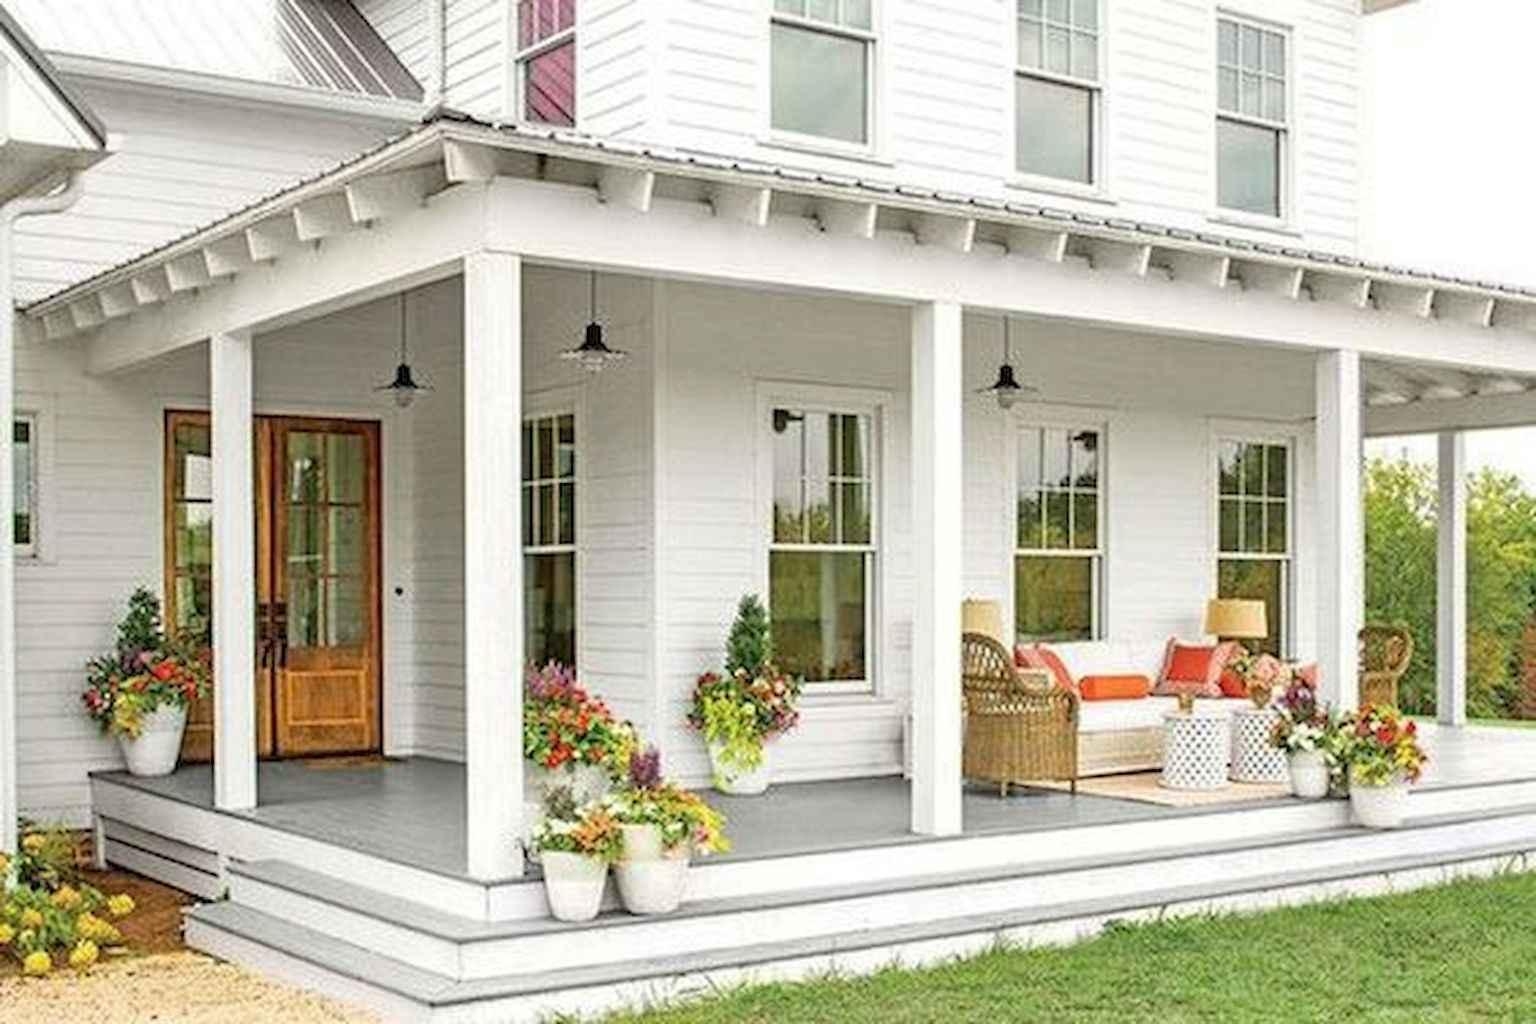 30 Rustic Farmhouse Front Porch Decorating Ideas - MOODecor.co